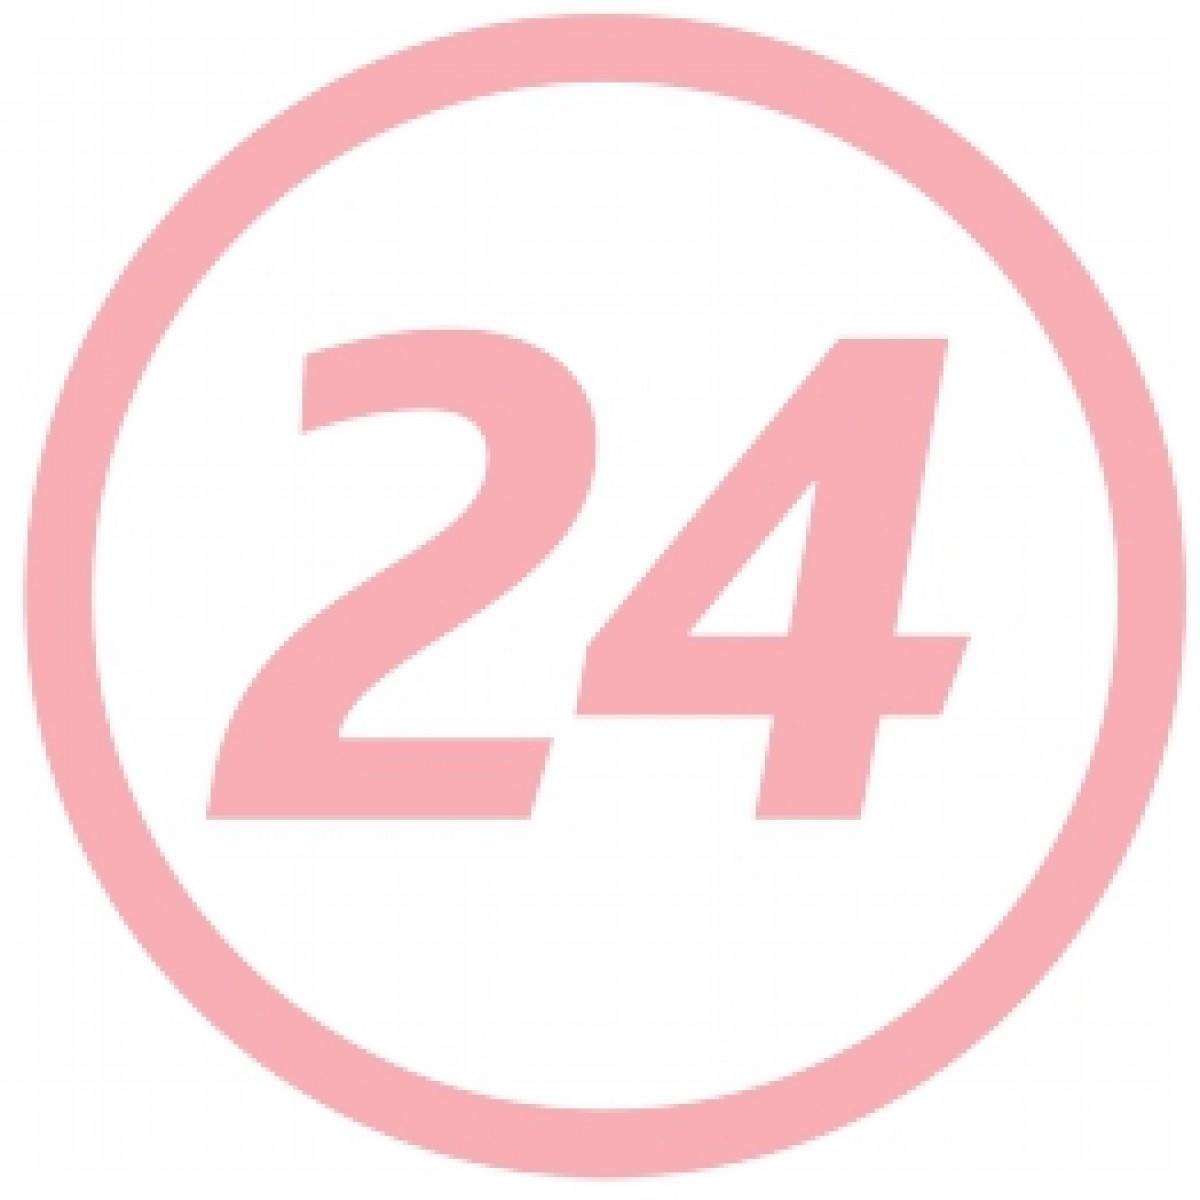 Soy-aid - Sun Wave Pharma, 60 capsule (Tulburari premenstruale si menopauza) - menopauza.bucovinart.ro